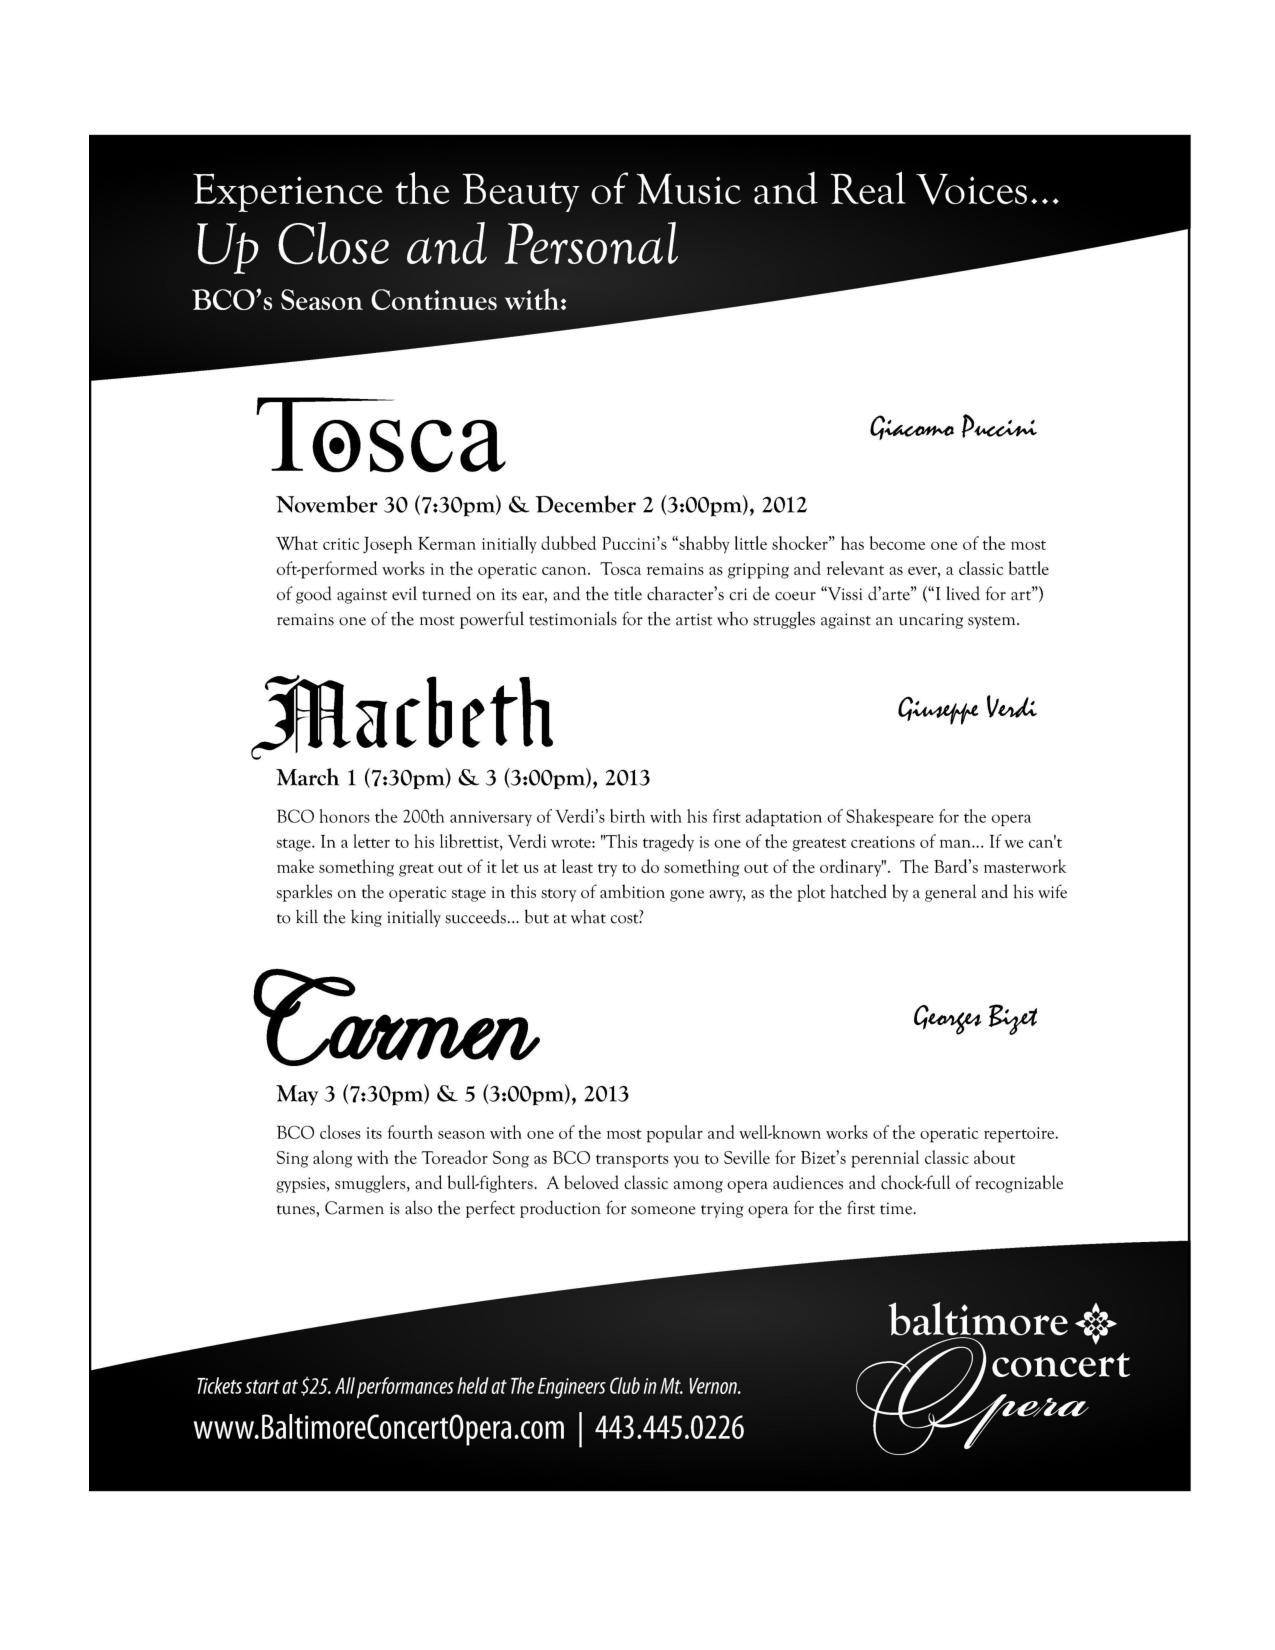 2012-12-16 Program Draft - 2012-12-11 v2-page-019.jpg